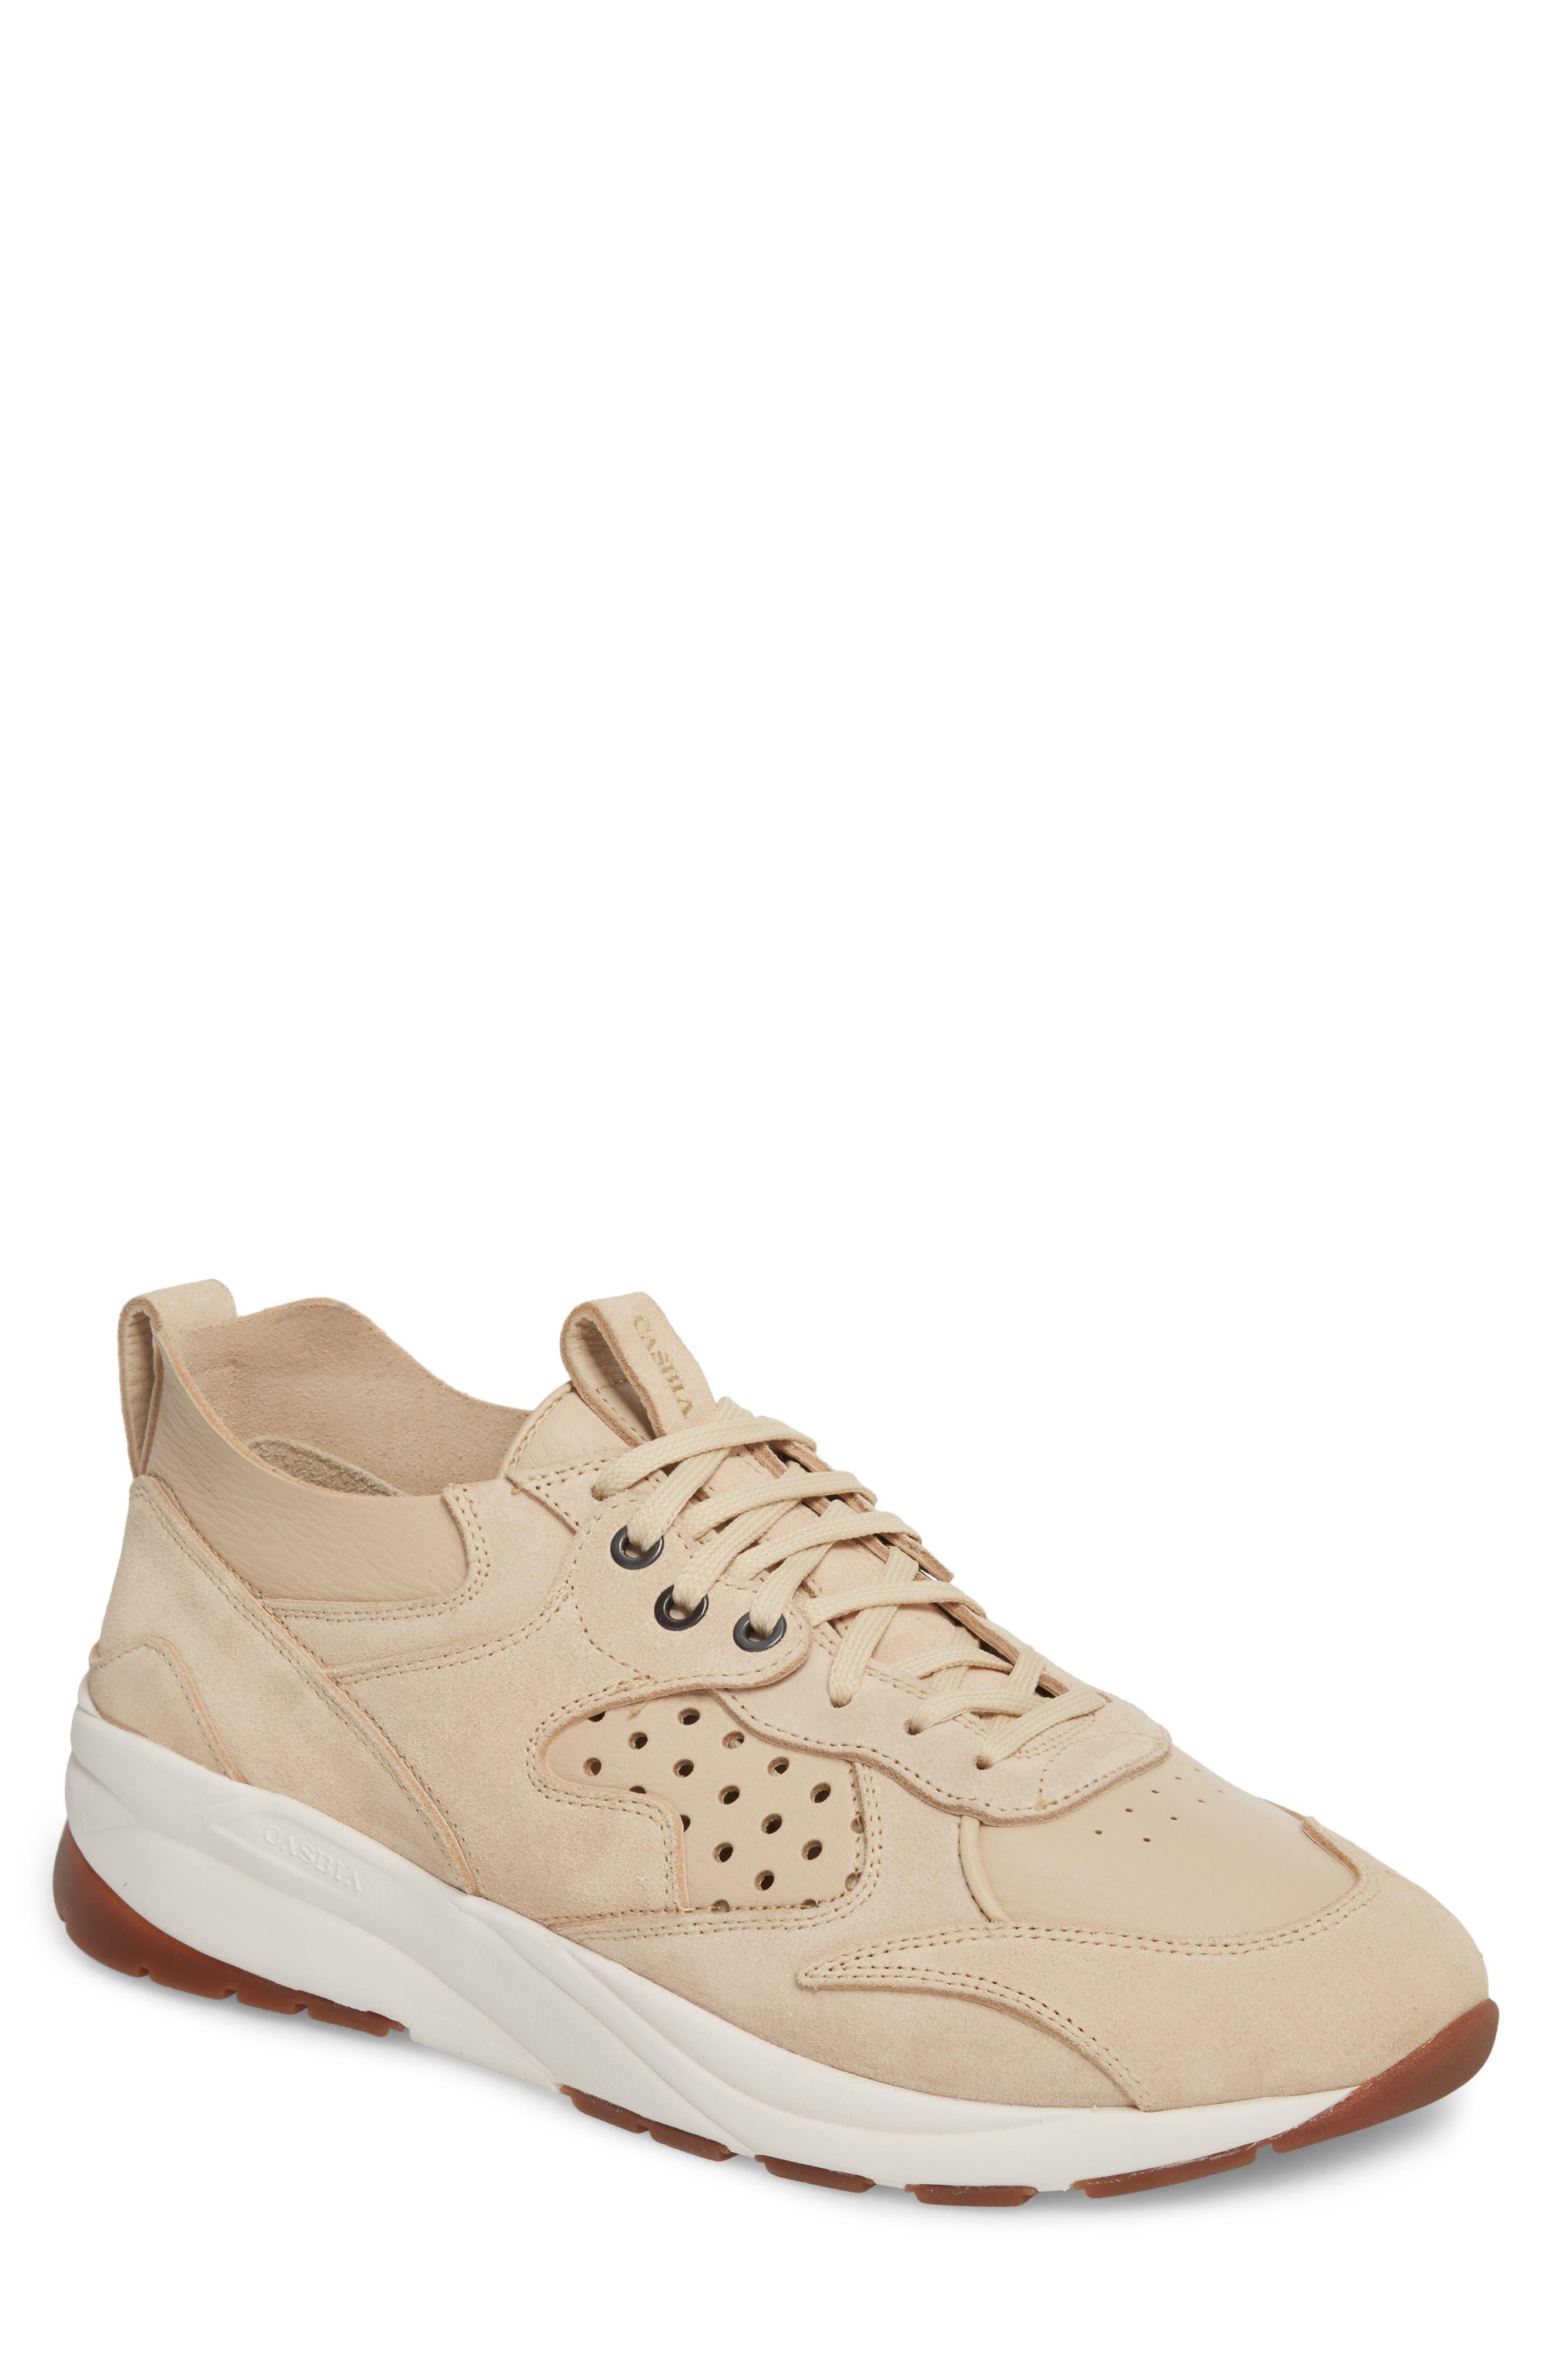 Champion Veloce Sneaker,                             Main thumbnail 1, color,